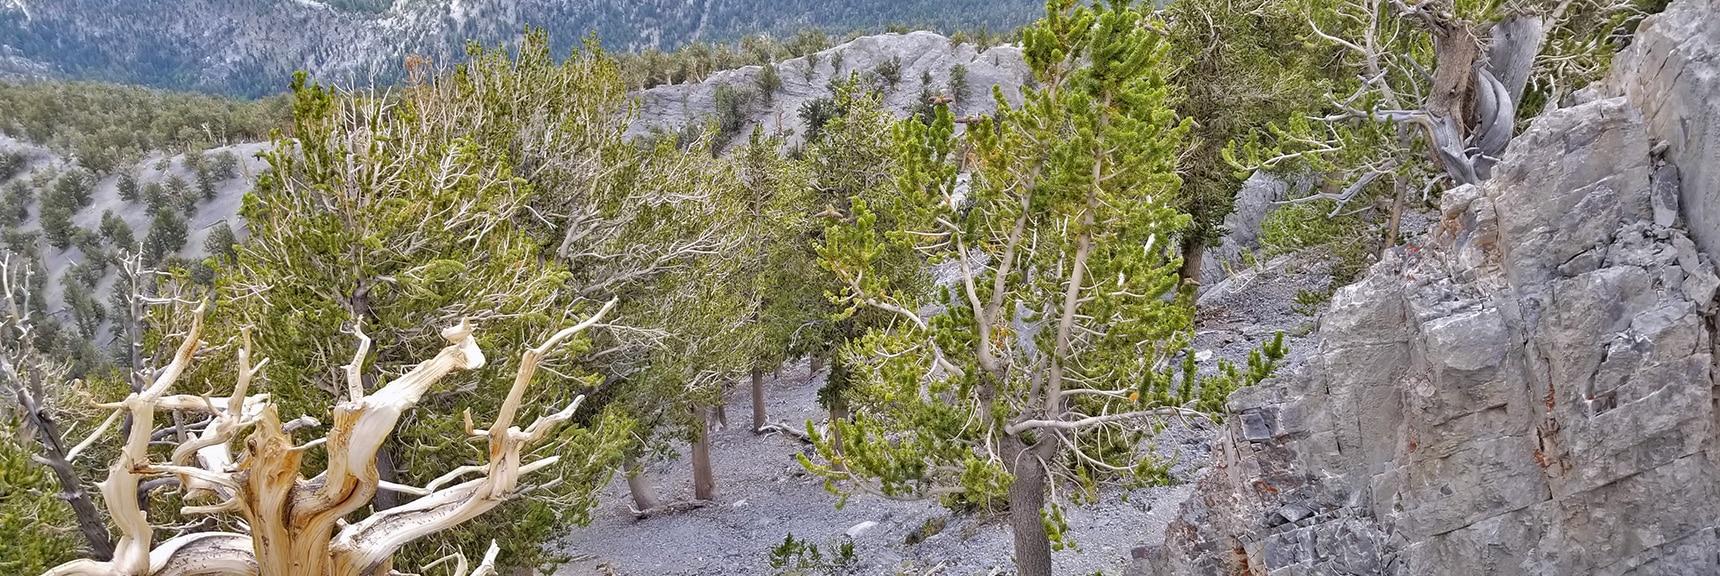 Potential Summit Approach Opening on Eastern Summit Cliffs   Mummy Mountain Northern Rim Overlook, Spring Mountain Wilderness, Nevada